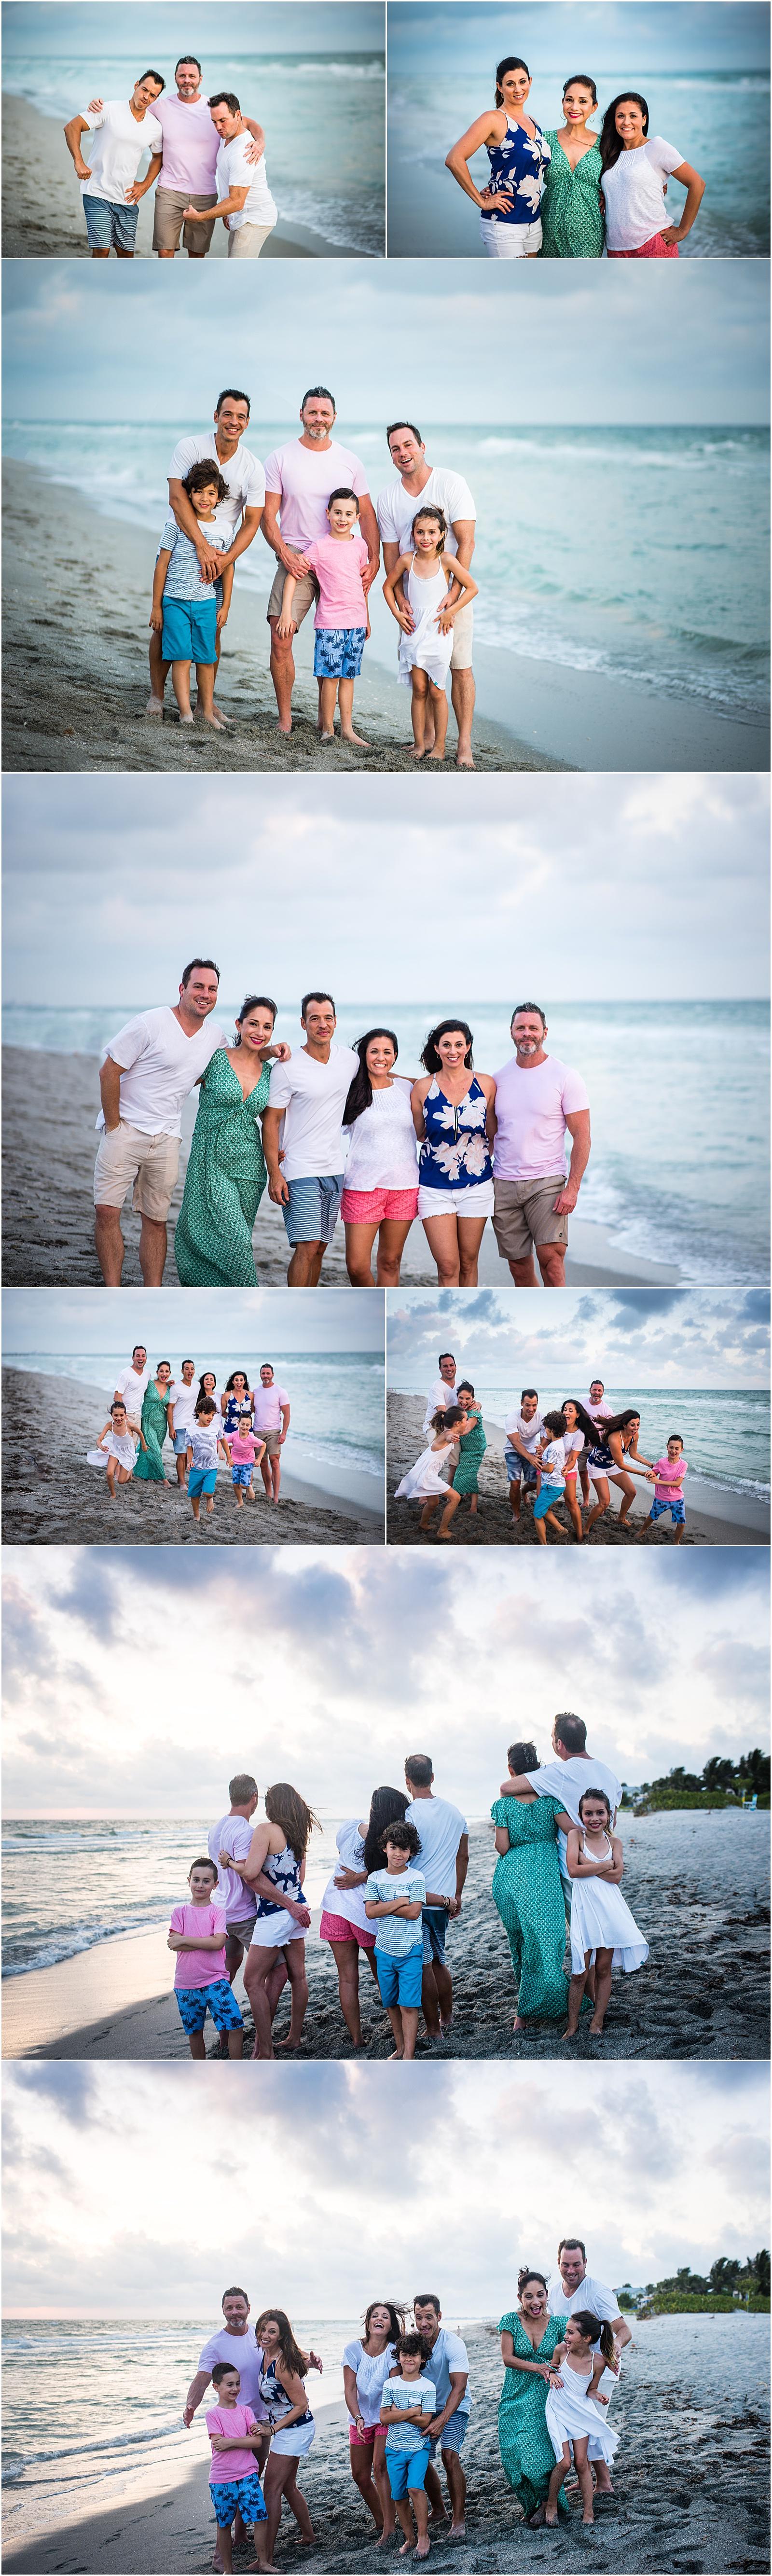 Beach_Friends5.jpg